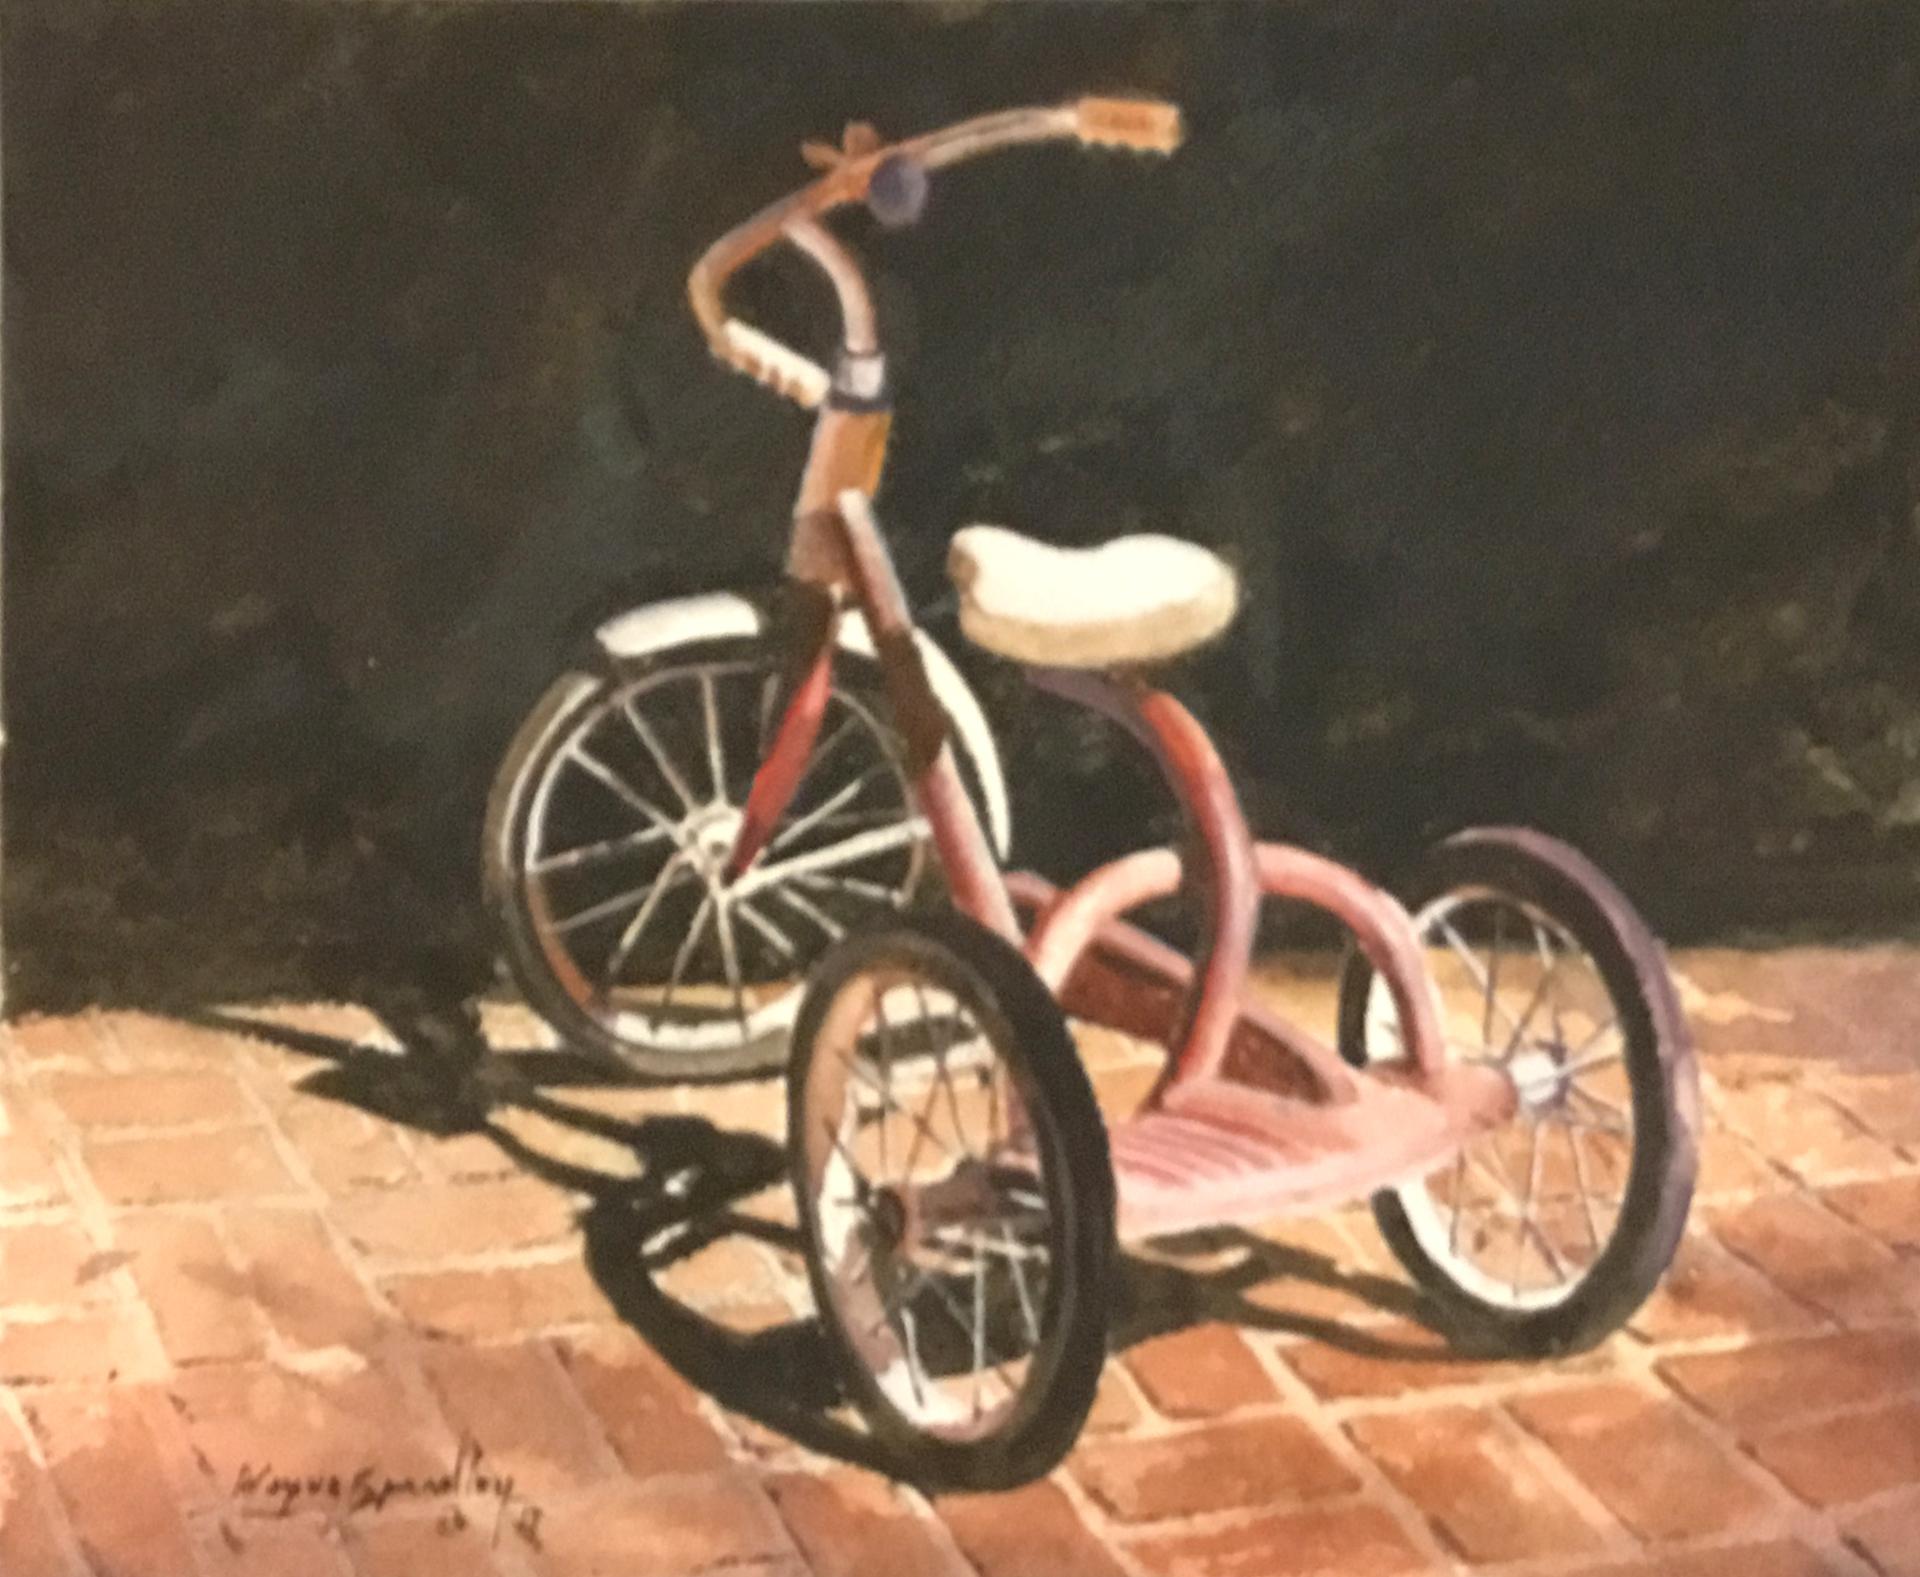 First Set of Wheels by Wayne Spradley